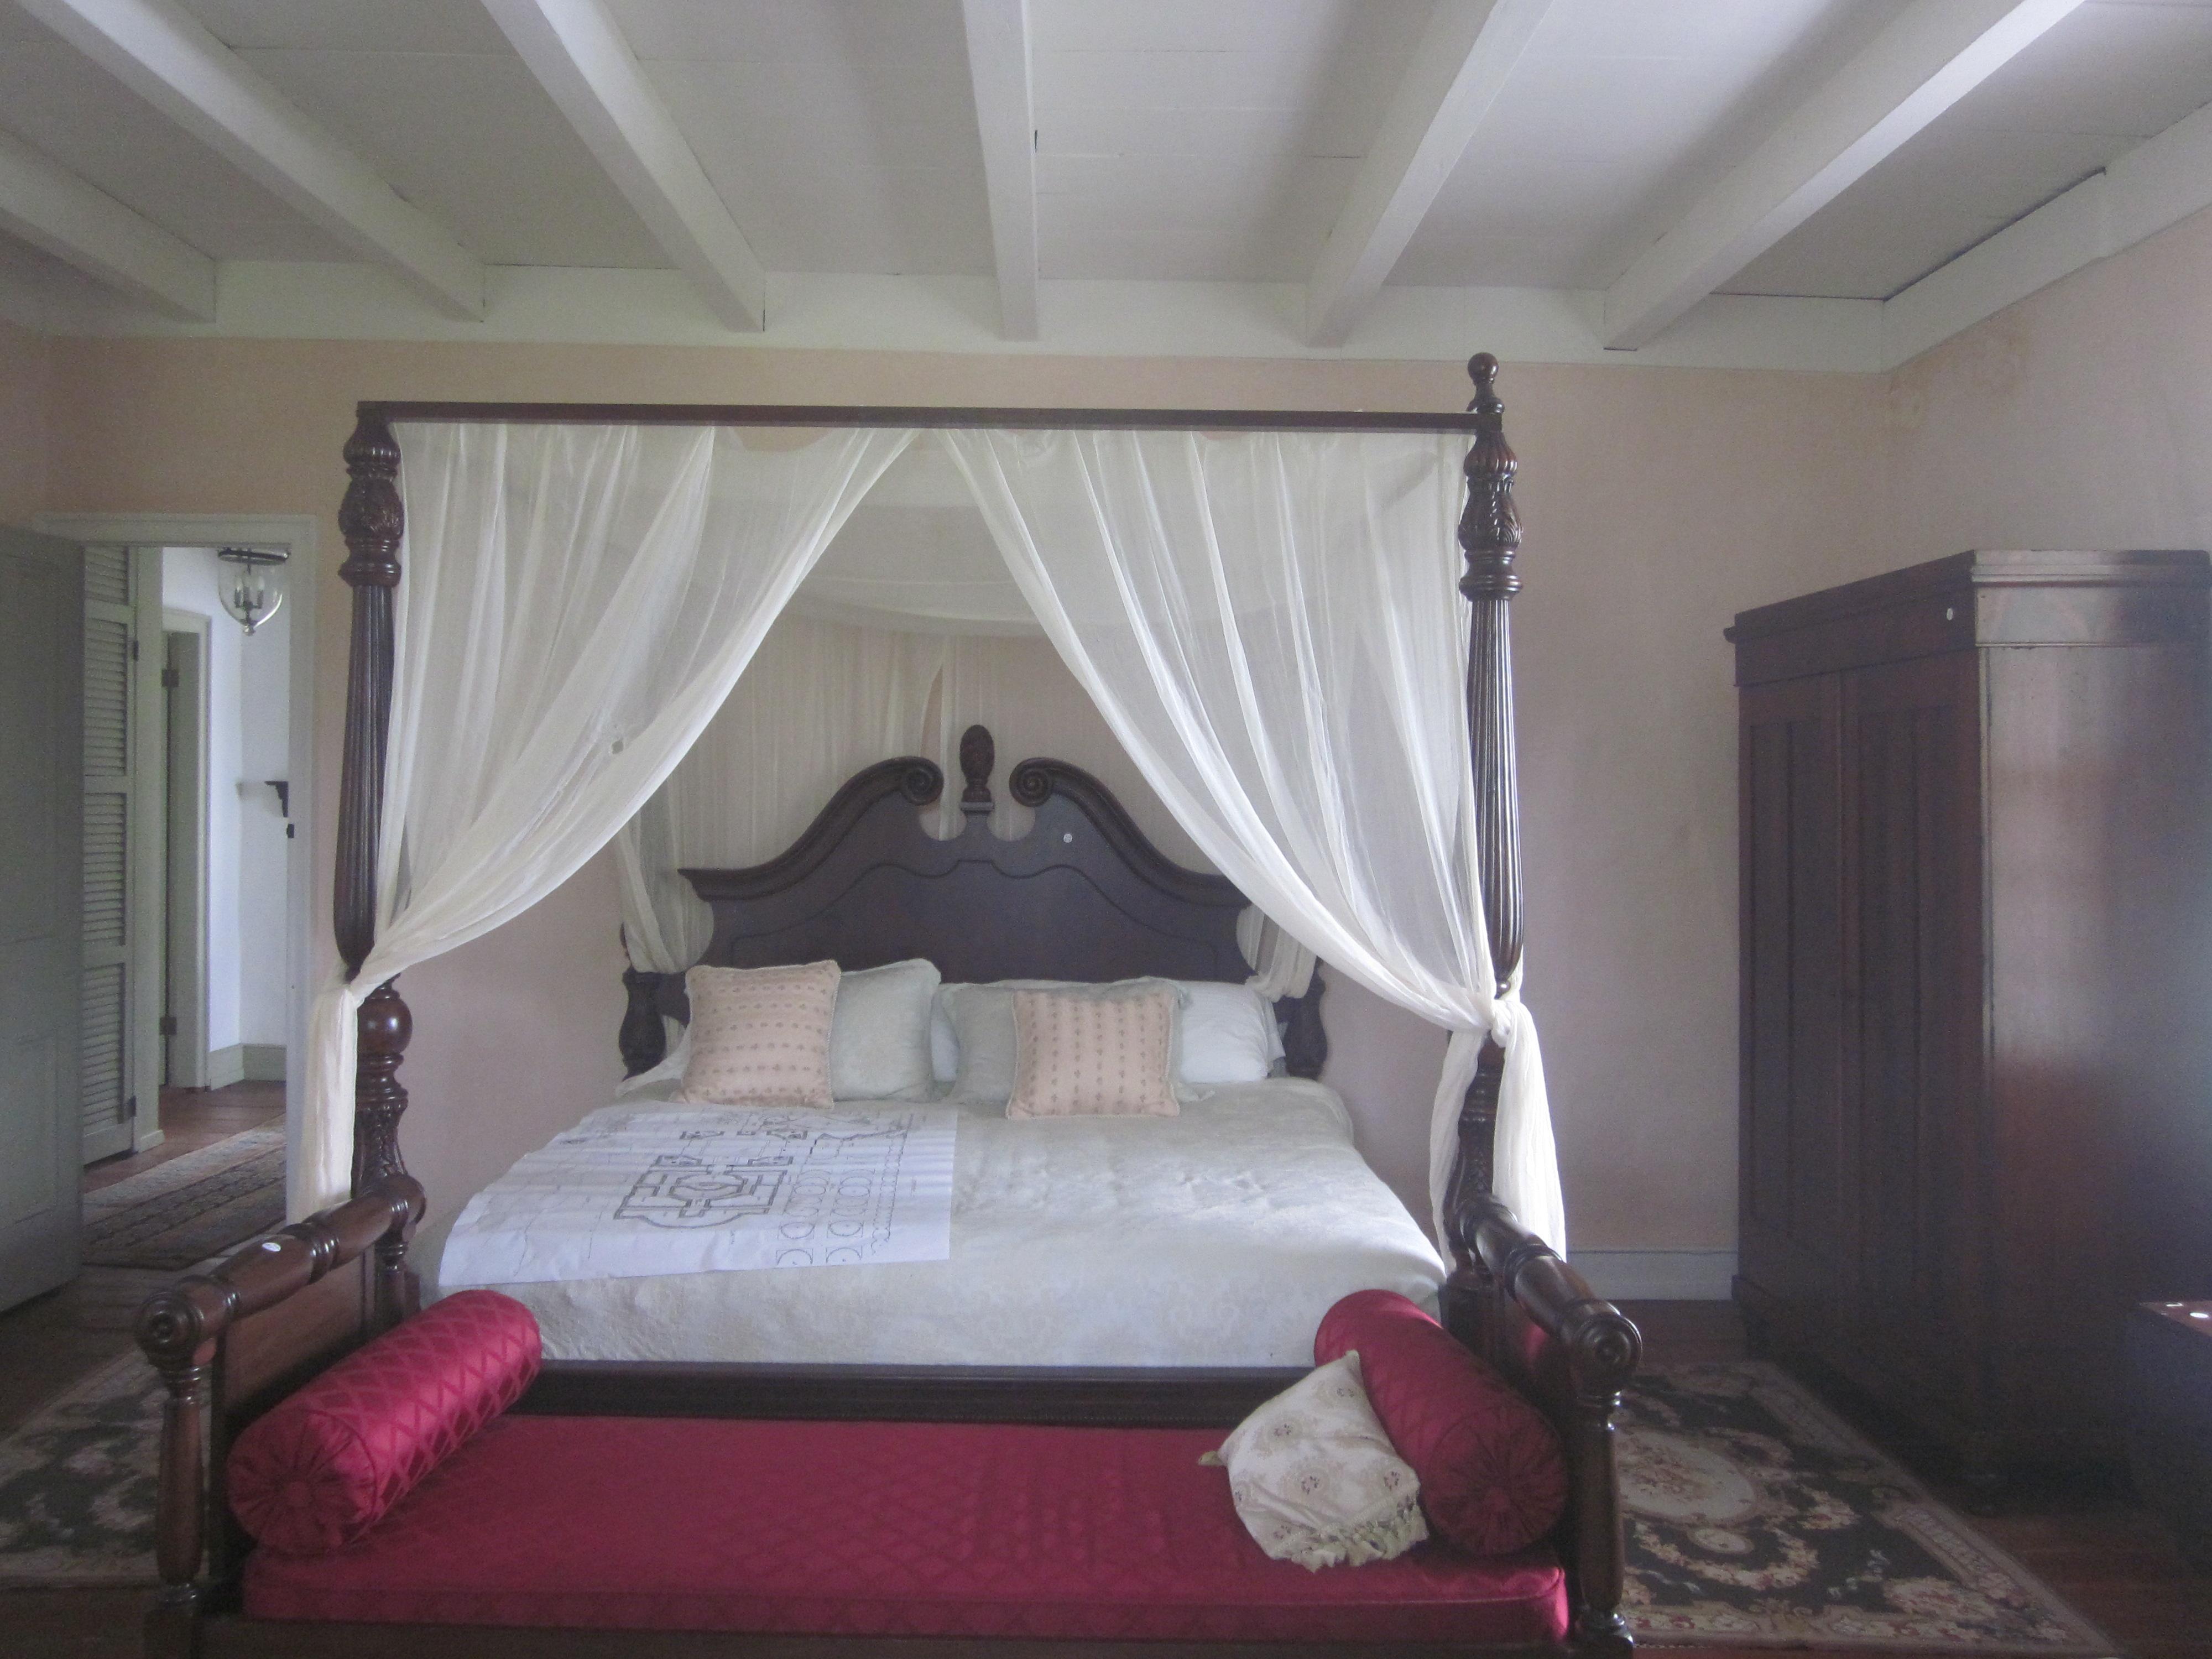 Big Room House Remix Dj Holy Grail